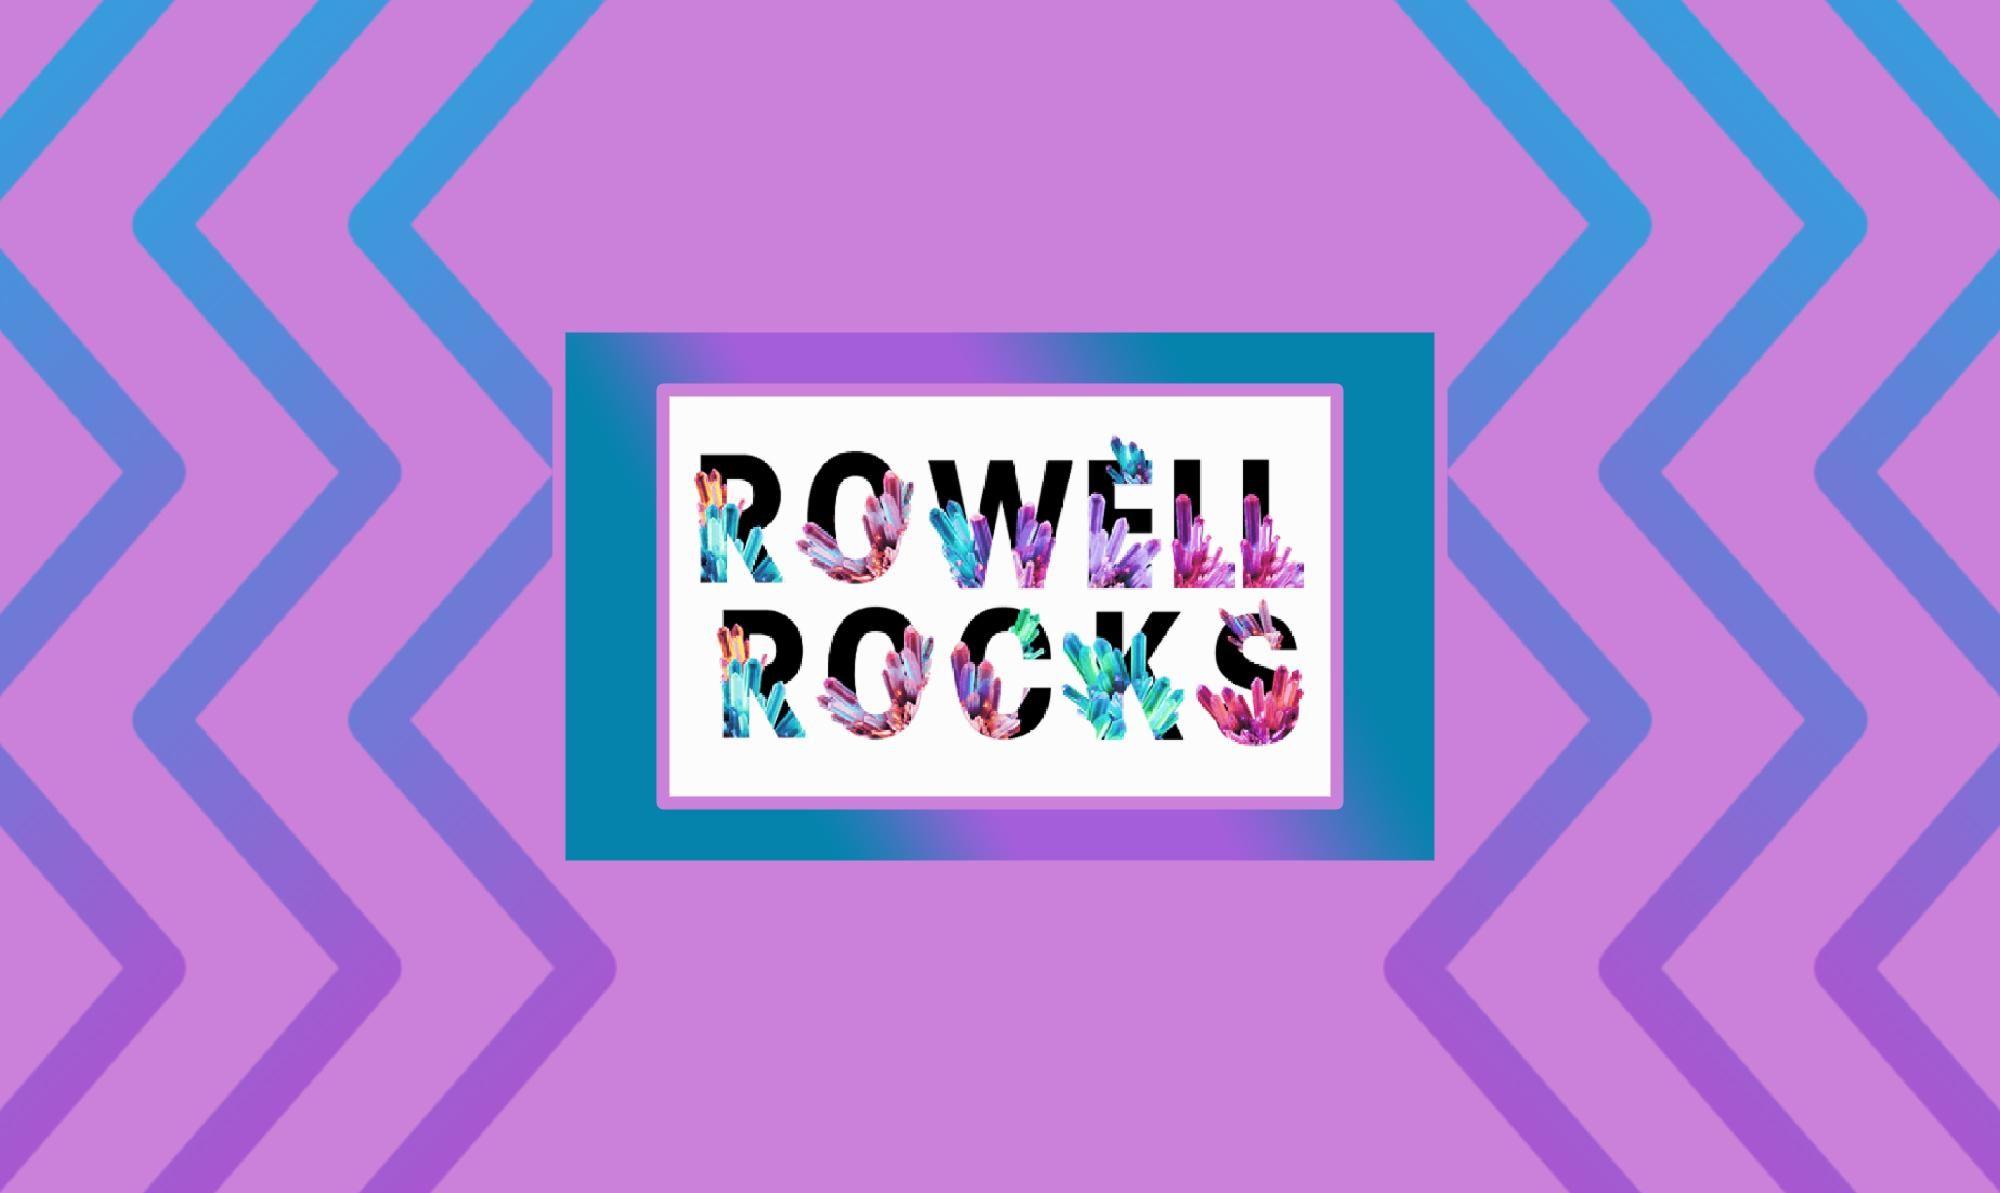 Rowell Trading Company